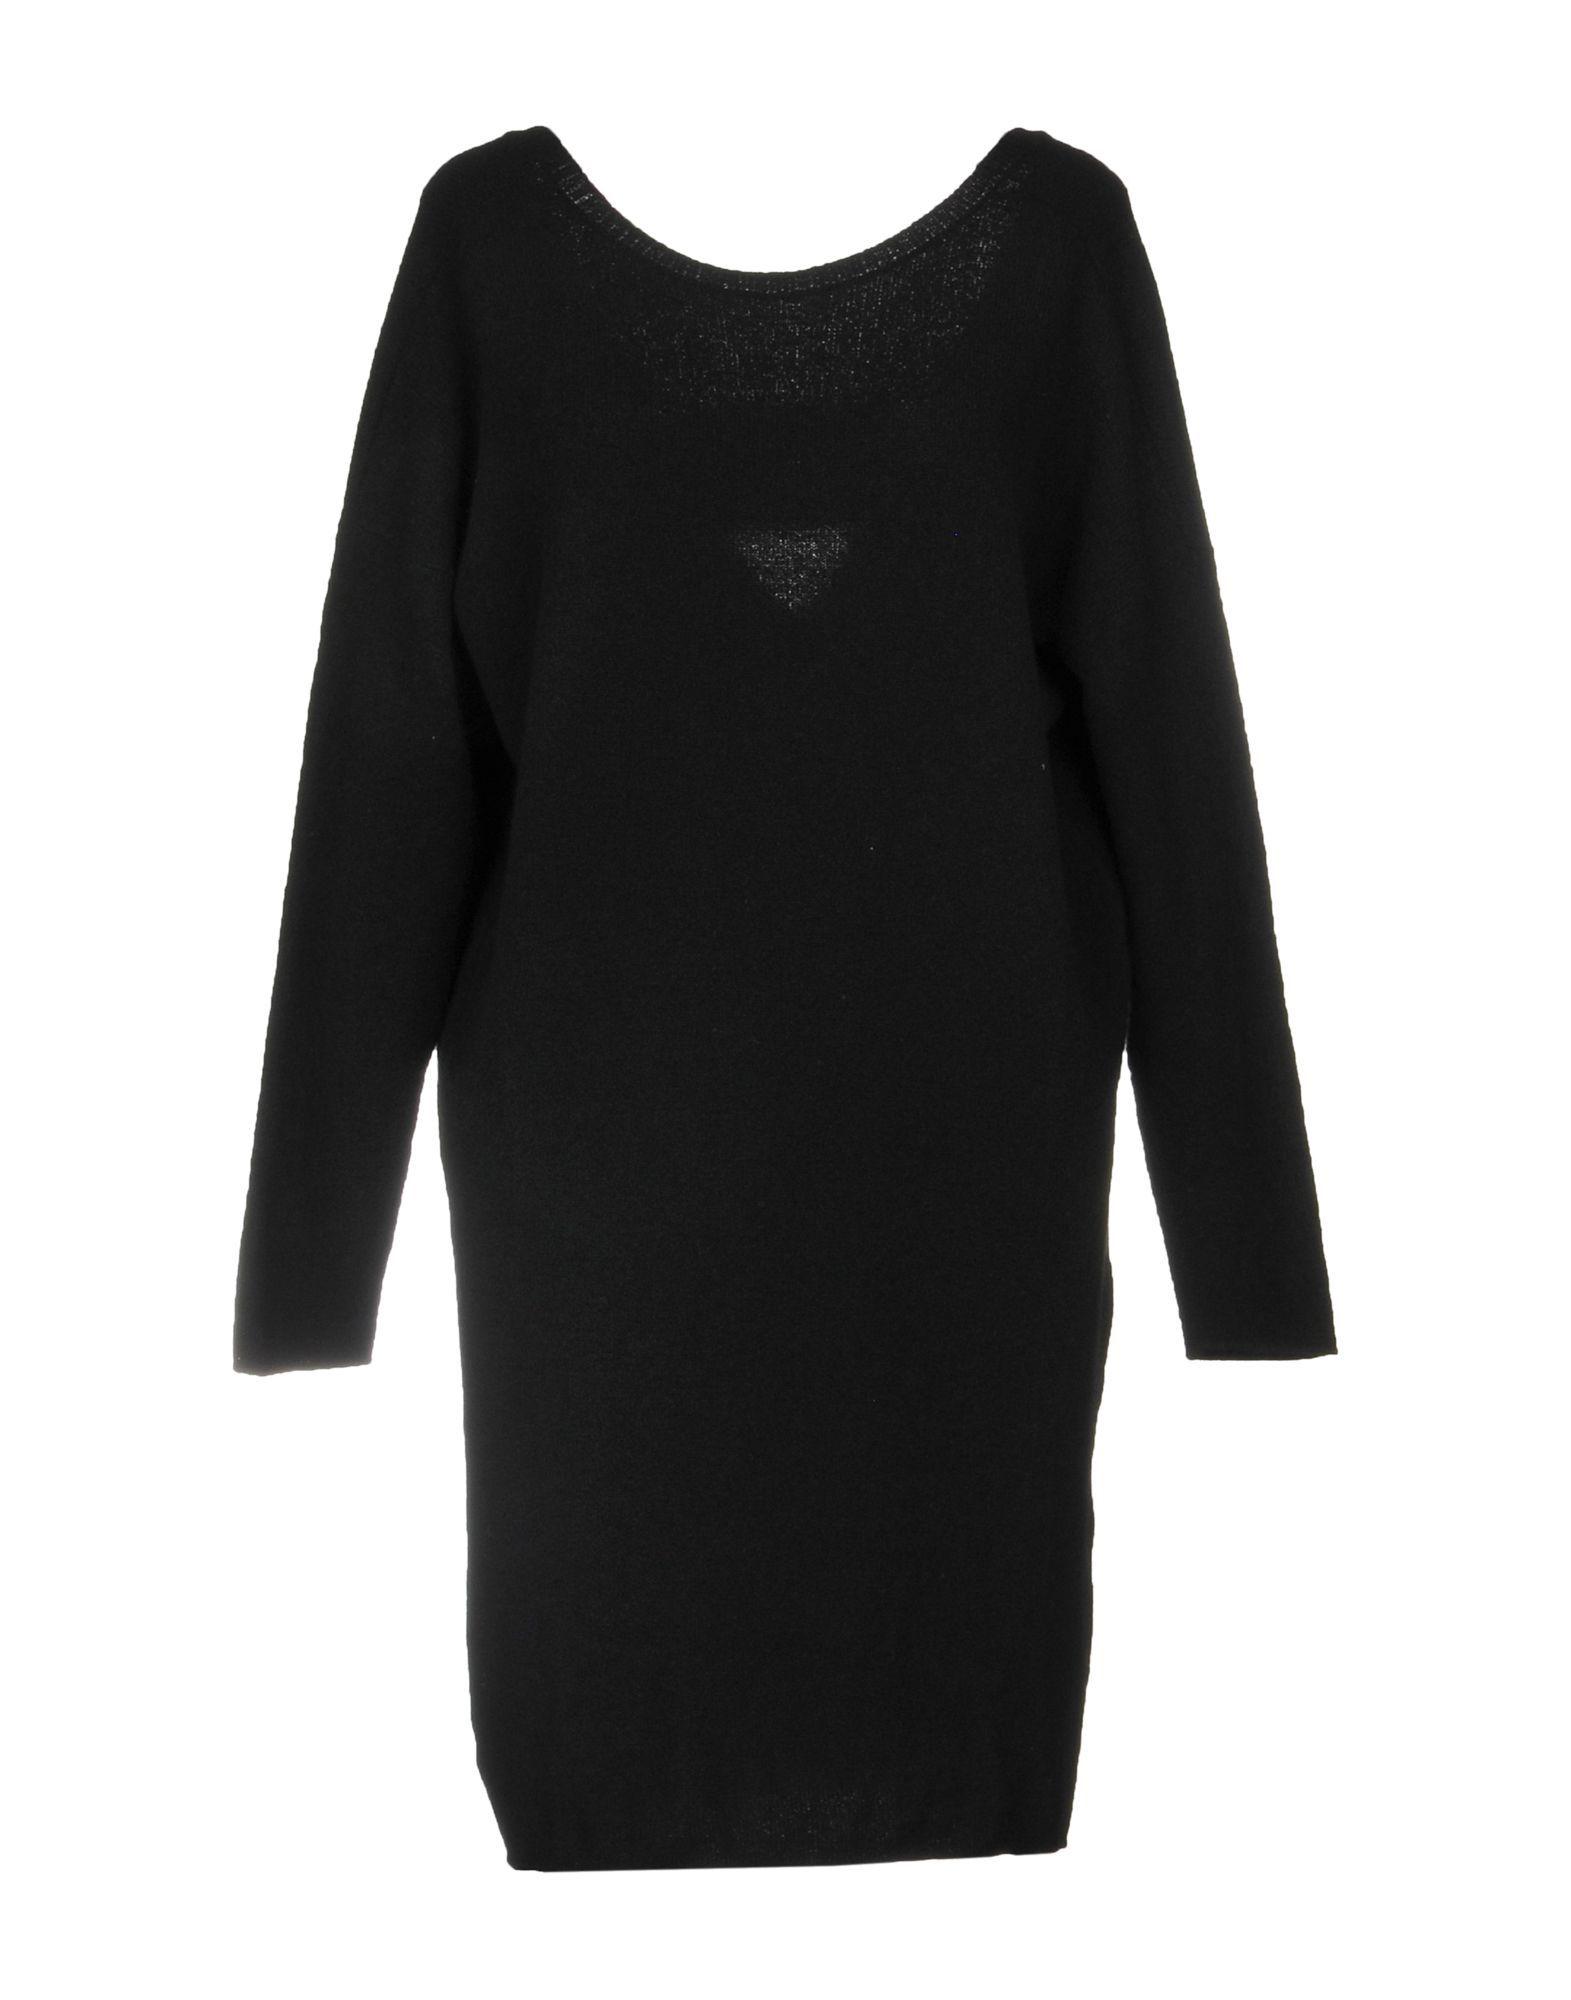 Dress Liviana Conti Black Women's Virgin Wool